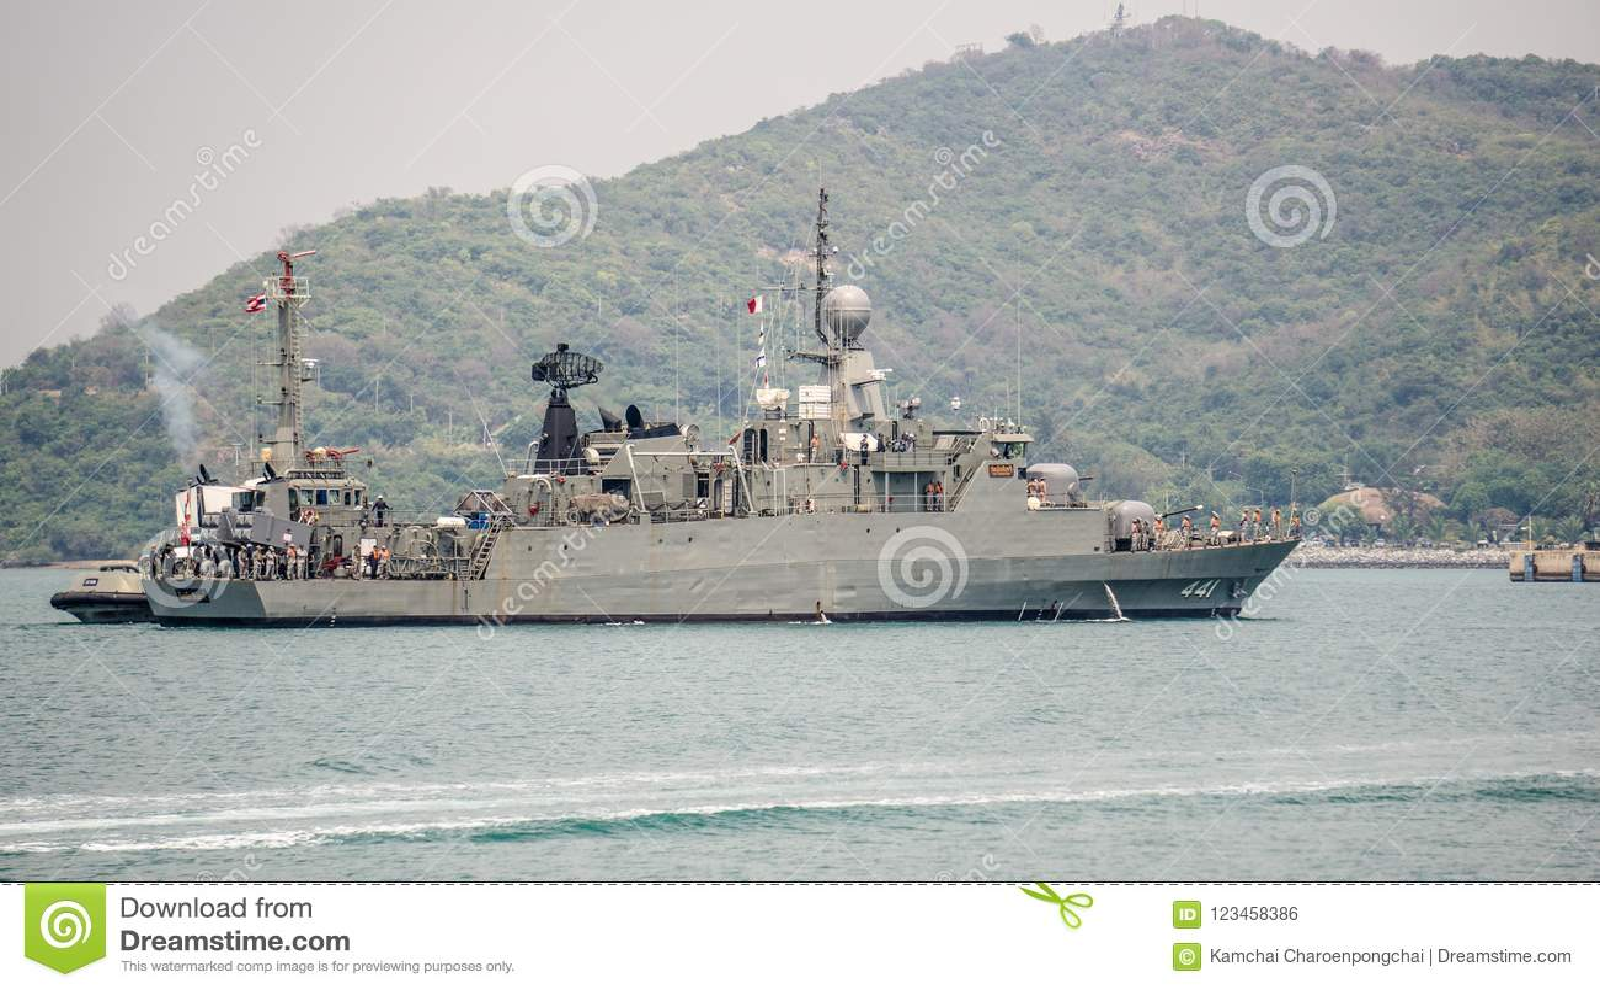 Tug Boat Supports HTMS Rattankosin Royal Thai Navy Corvette